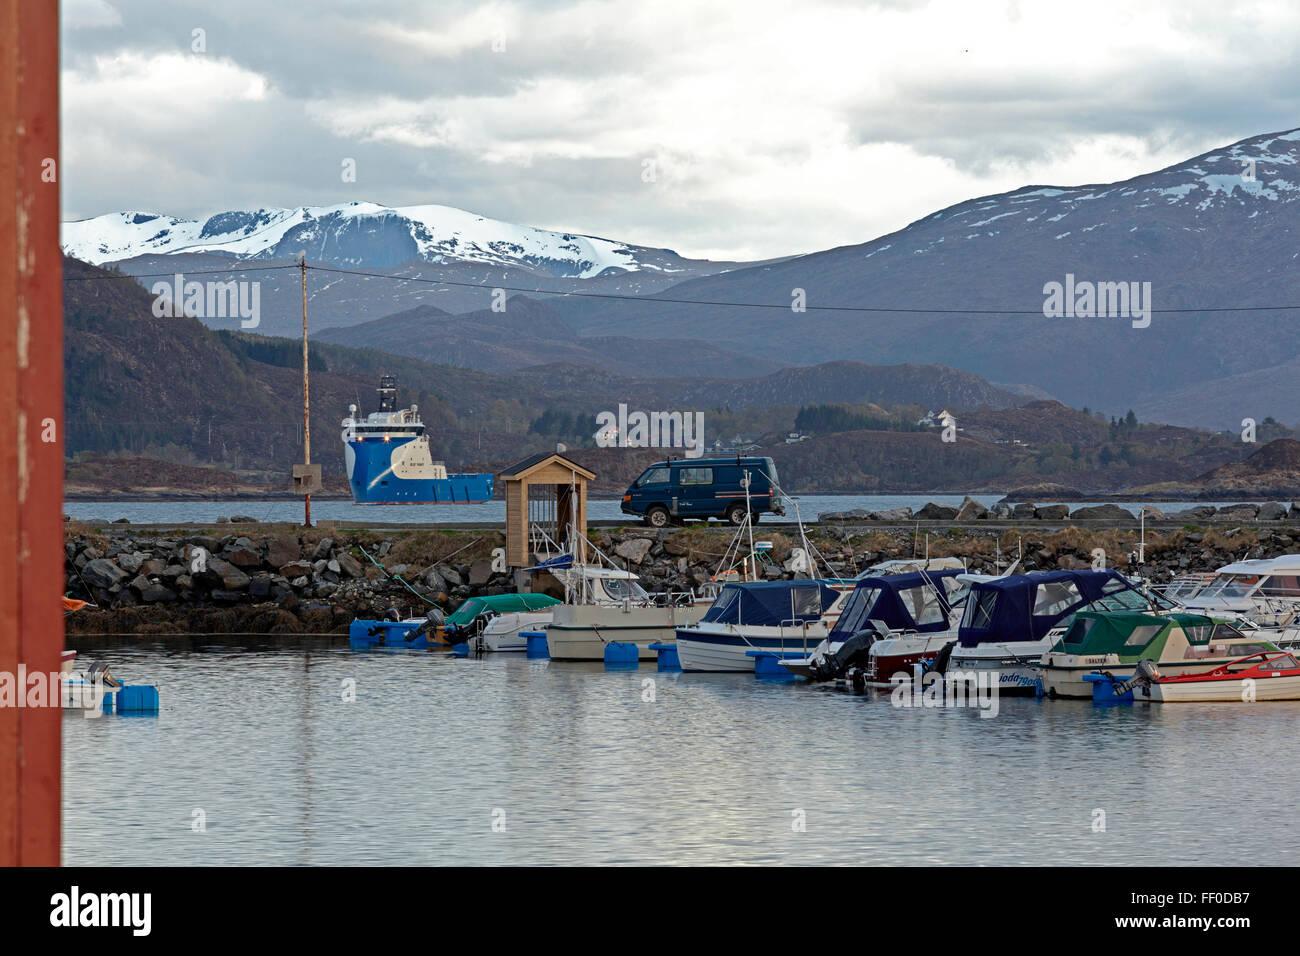 Platform Supply Vessel Stock Photos & Platform Supply Vessel Stock